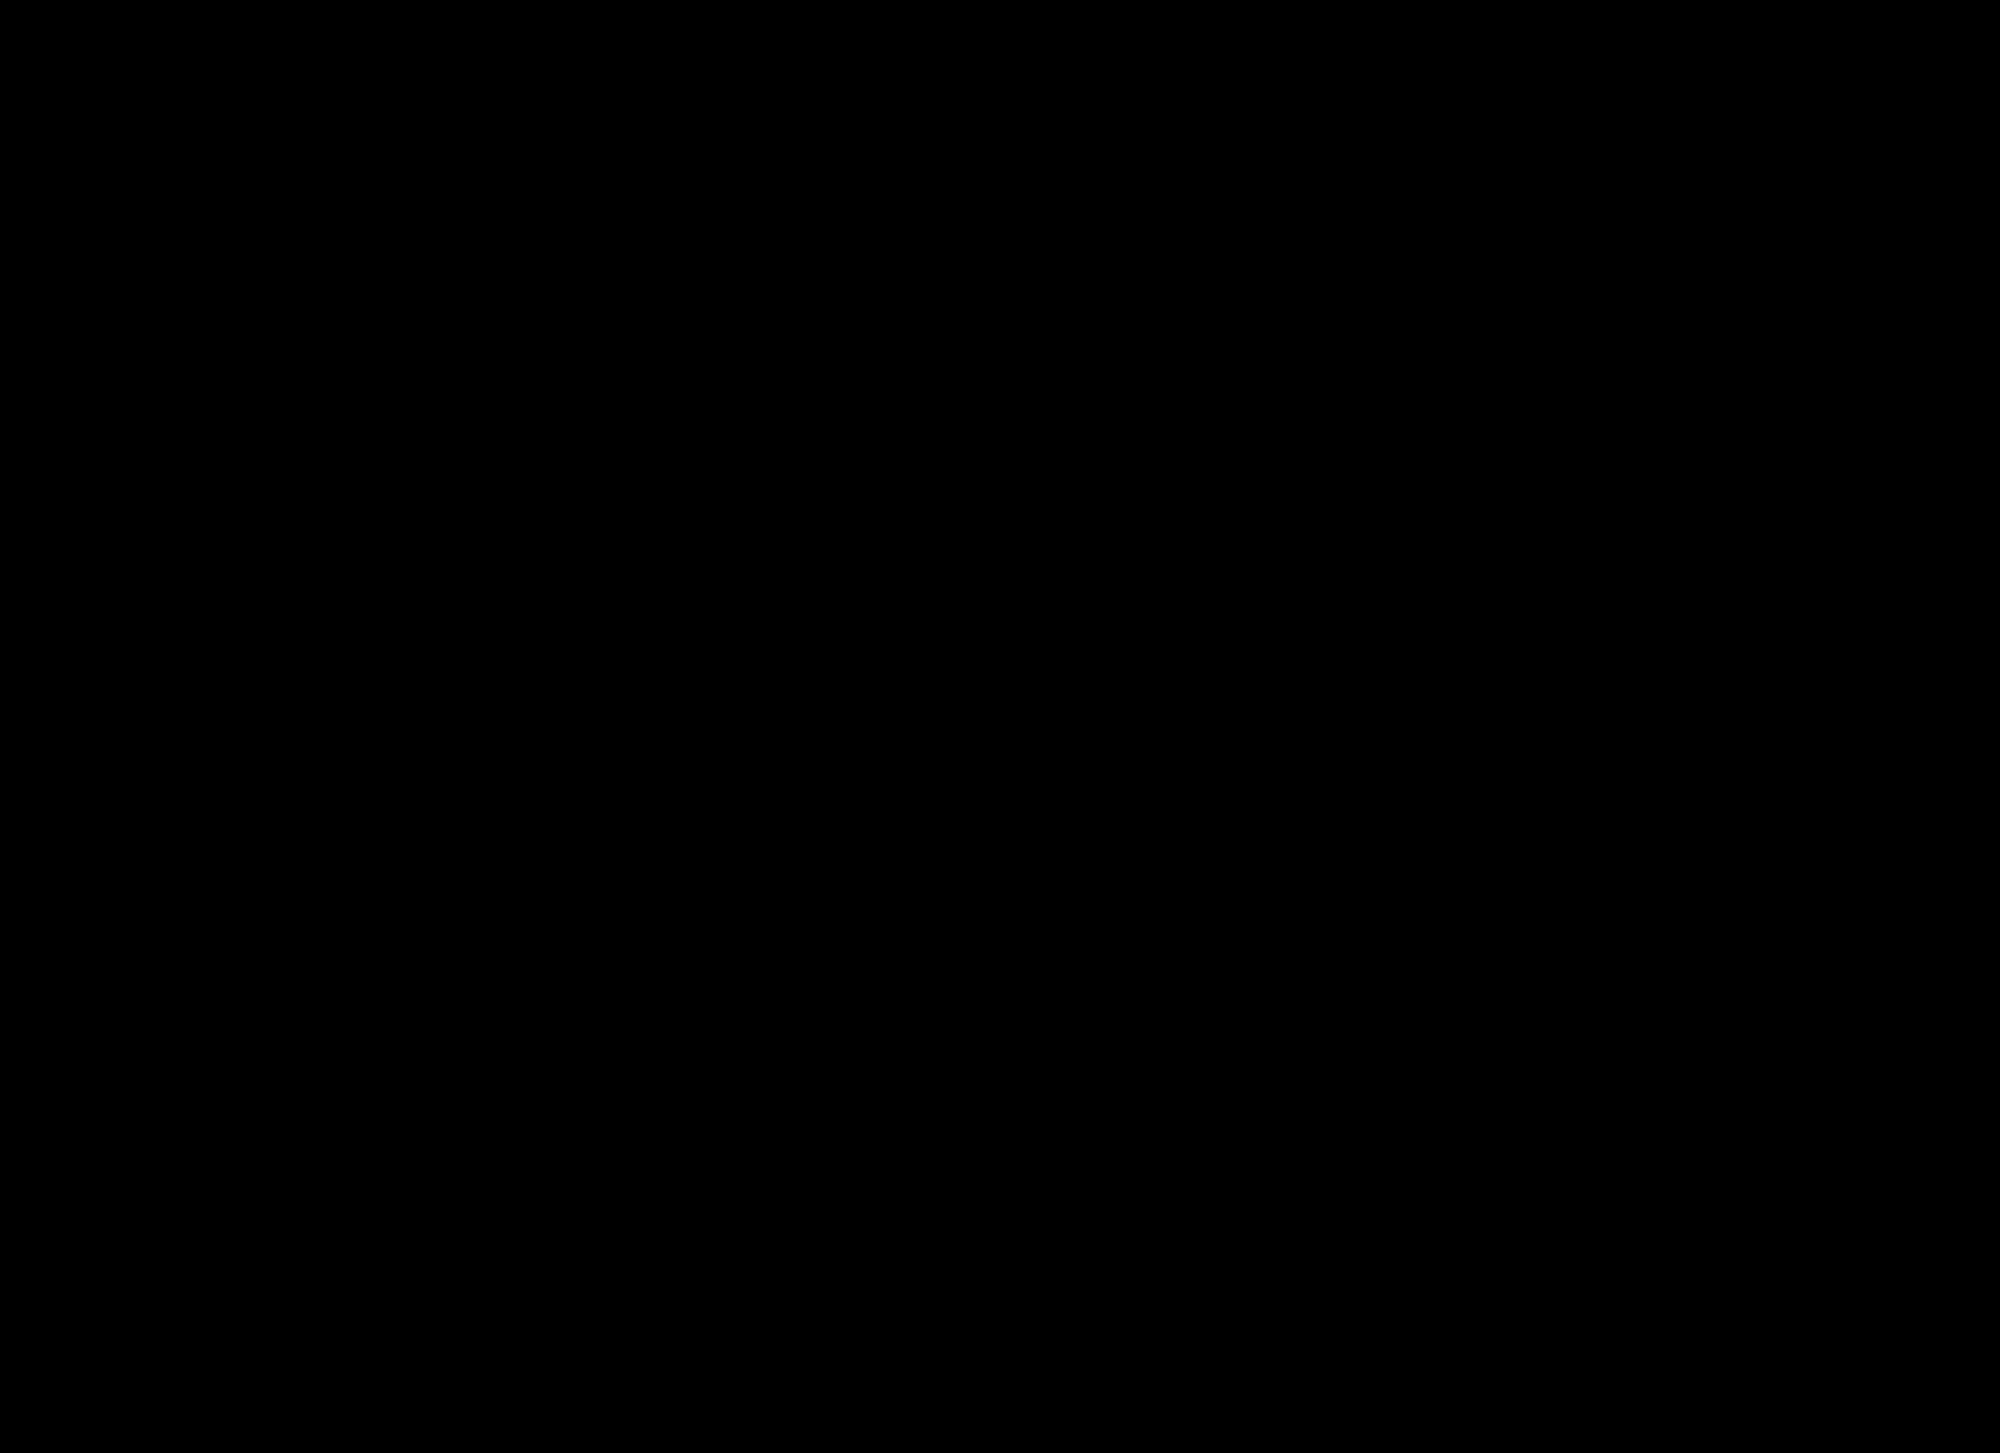 Base noire fond